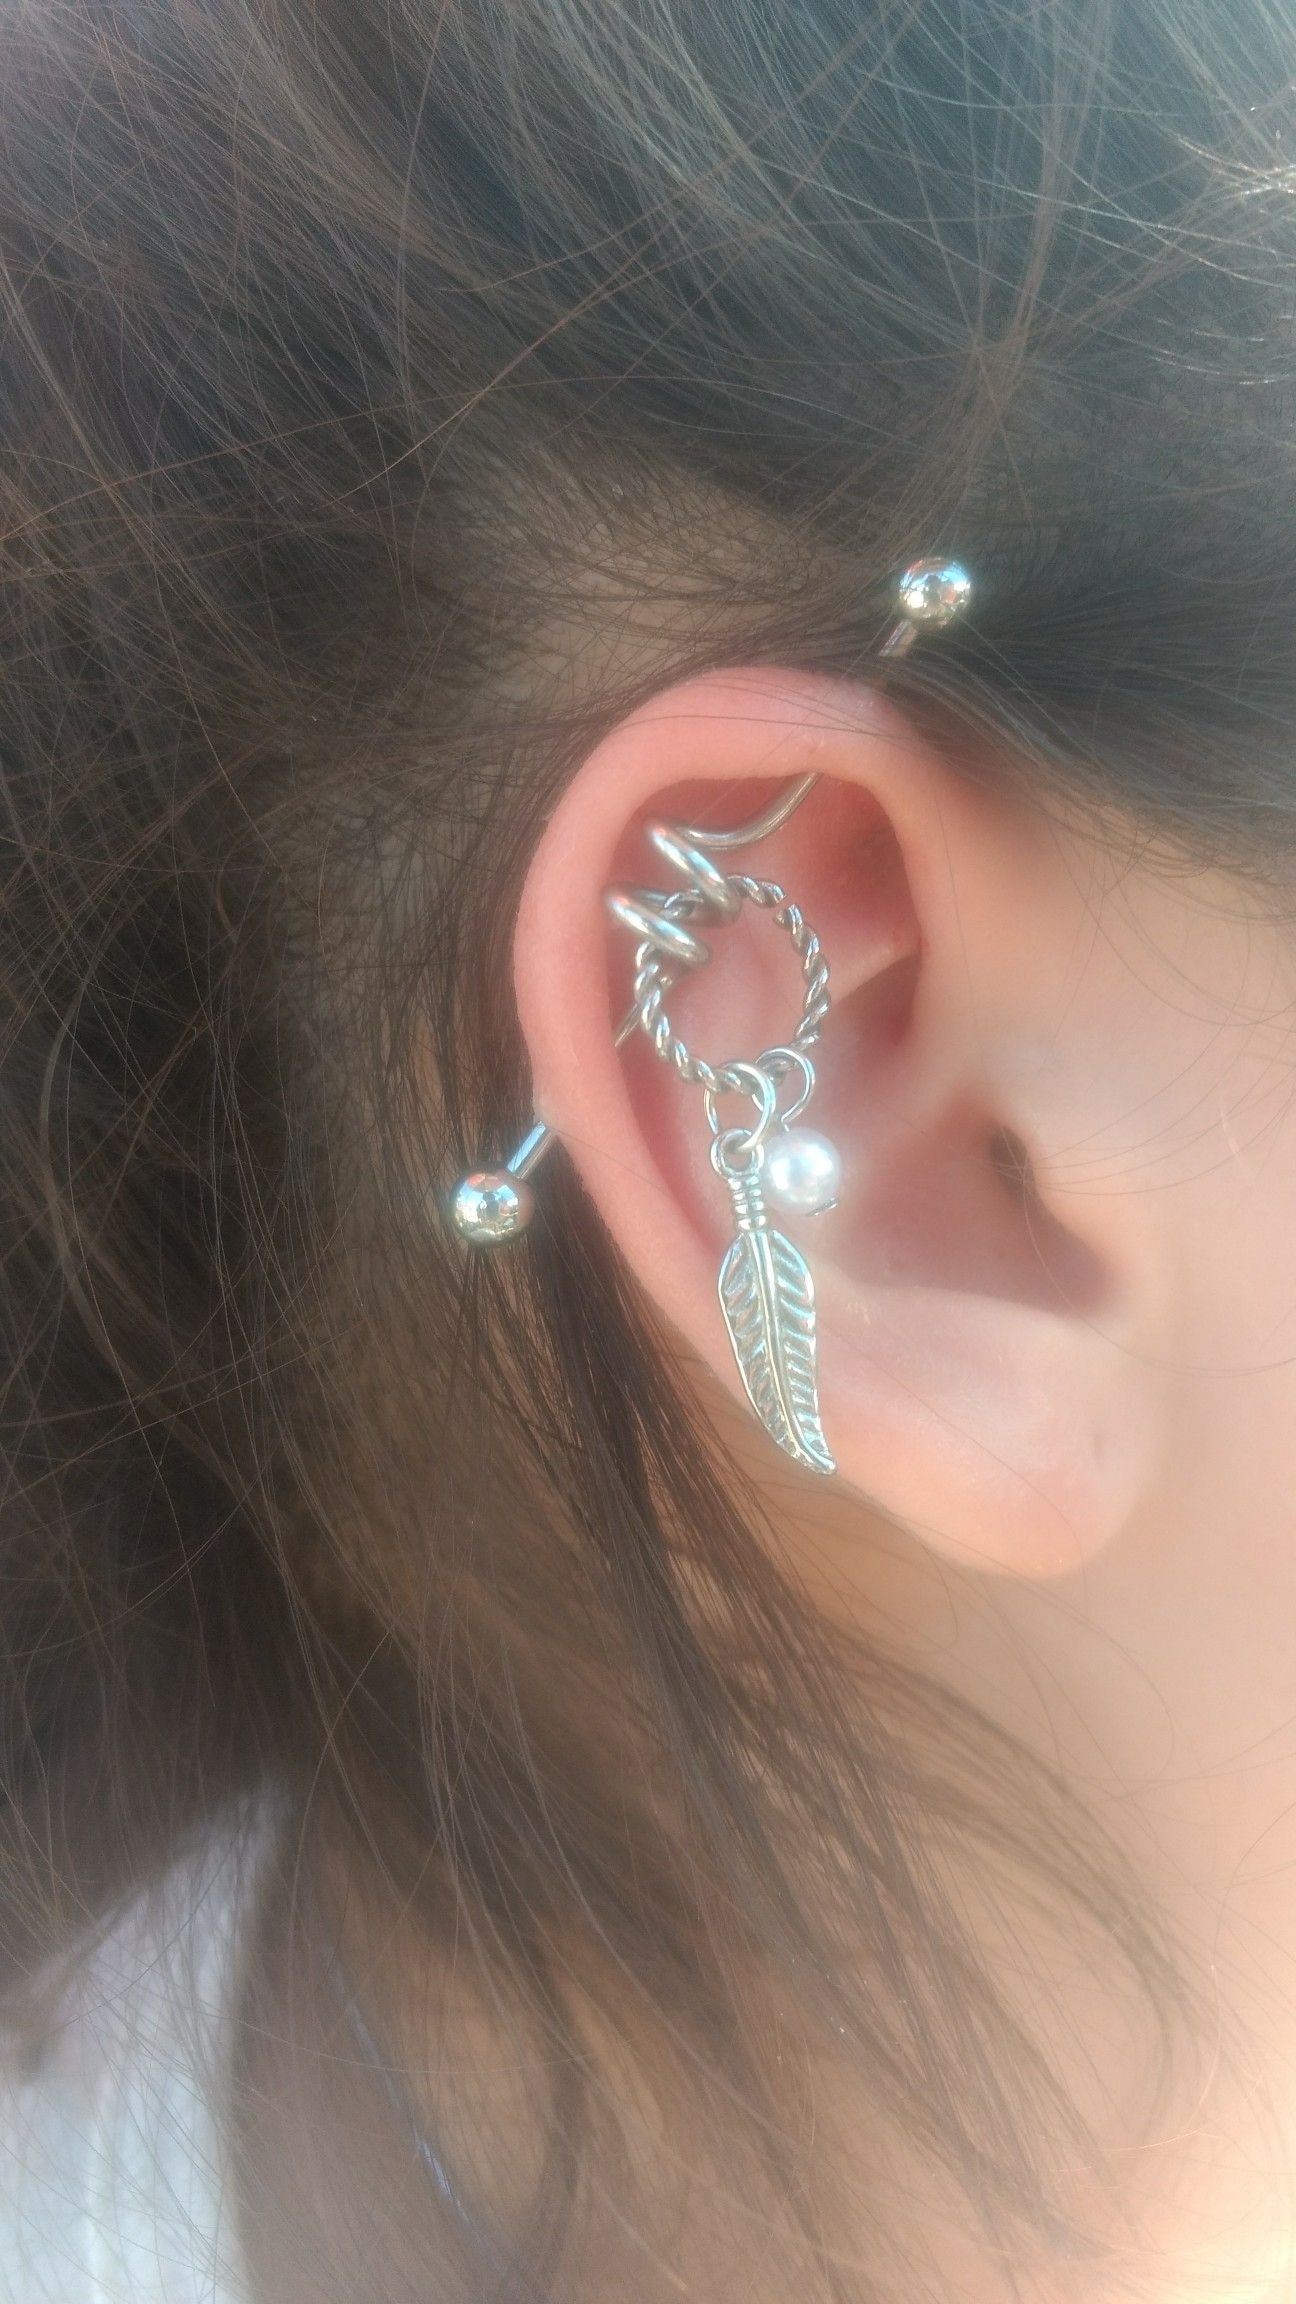 Ear Bar Industrial Piercing Piercing Pinterest Industrial